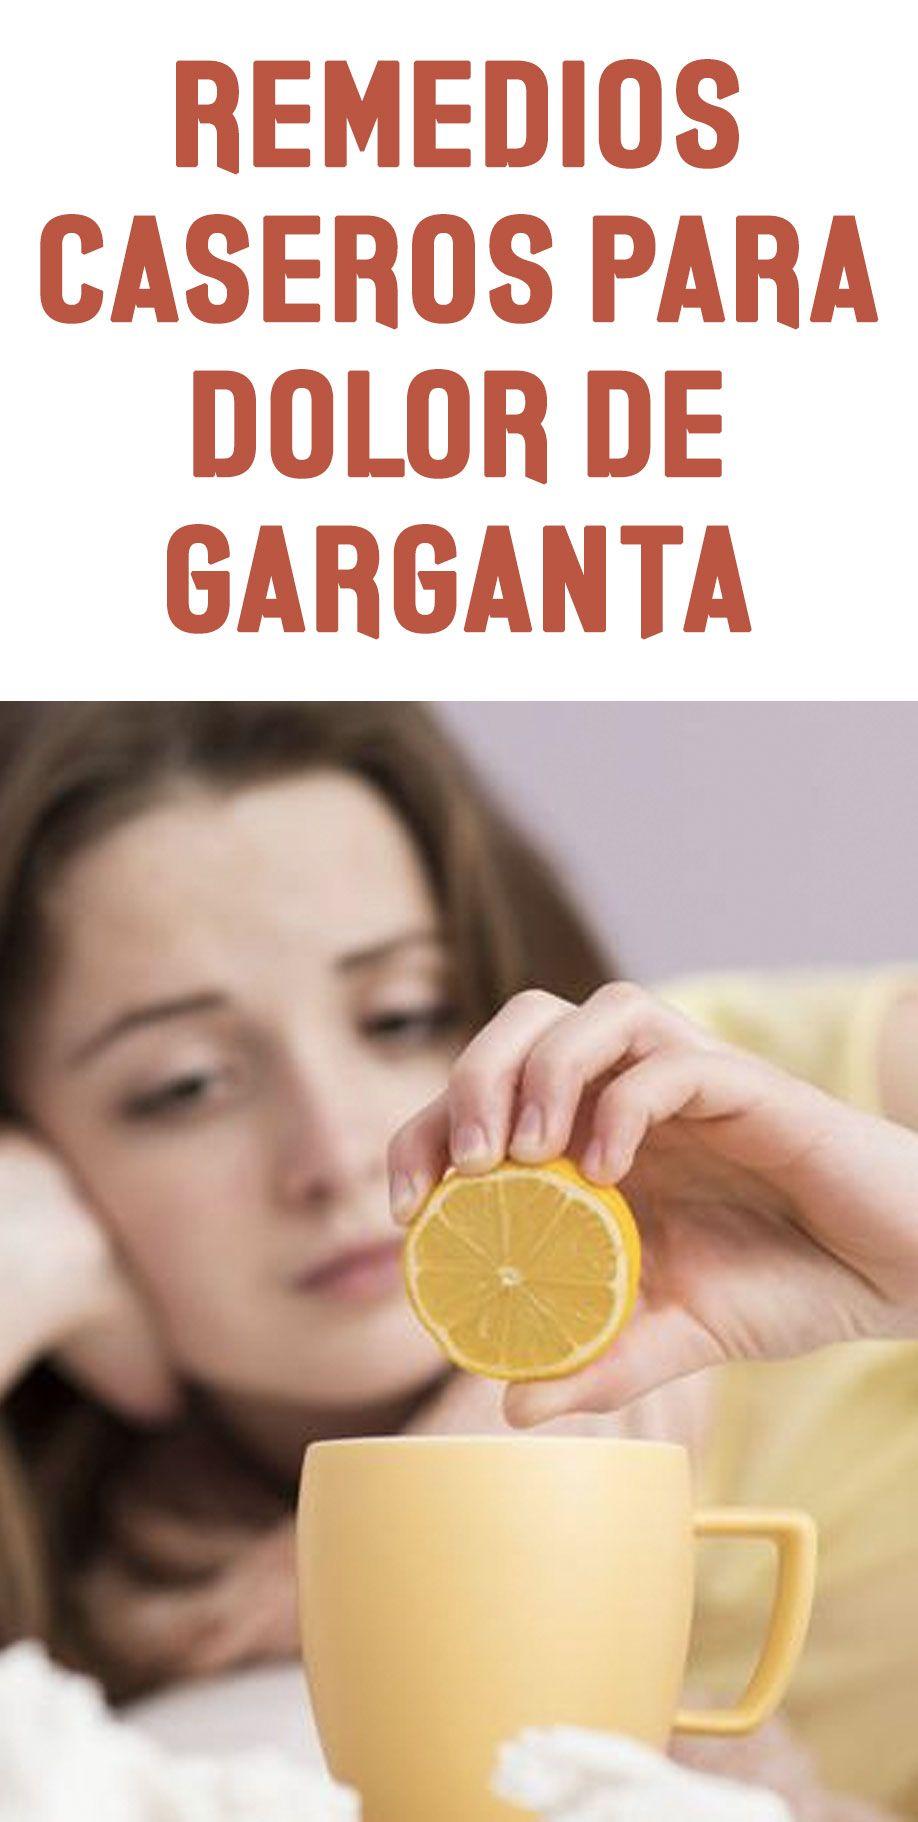 Remedios Caseros Para Dolor De Garganta Hand Soap Bottle Soap Bottle Diabetes